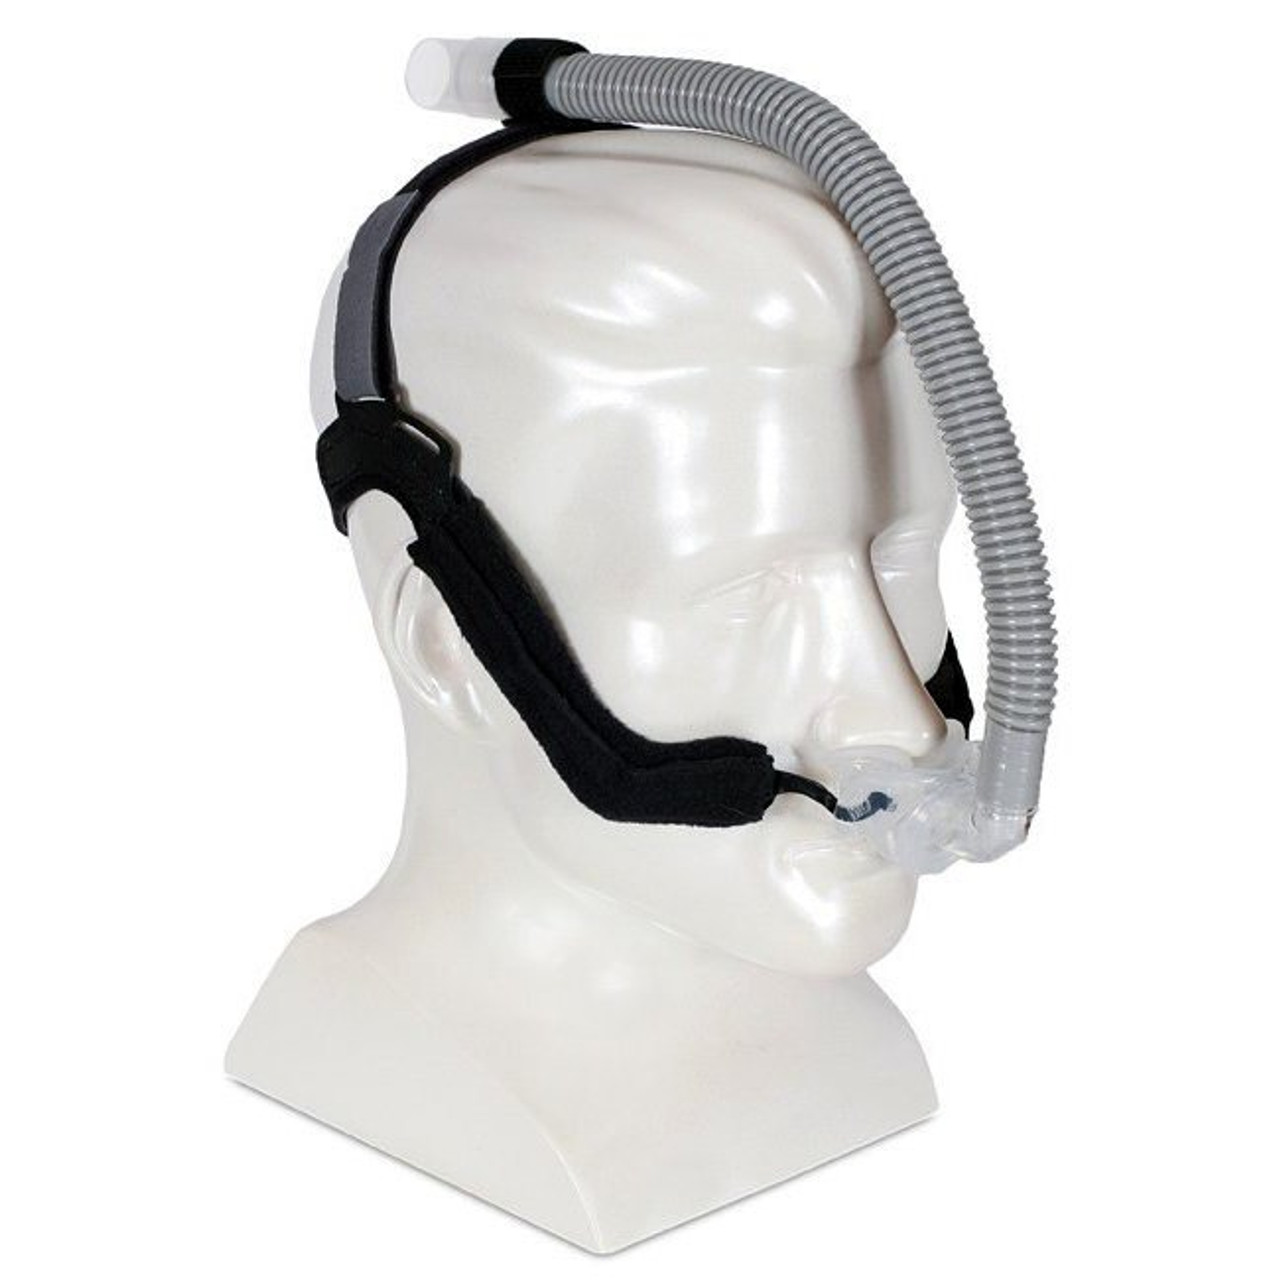 aloha nasal pillow cpap mask with headgear